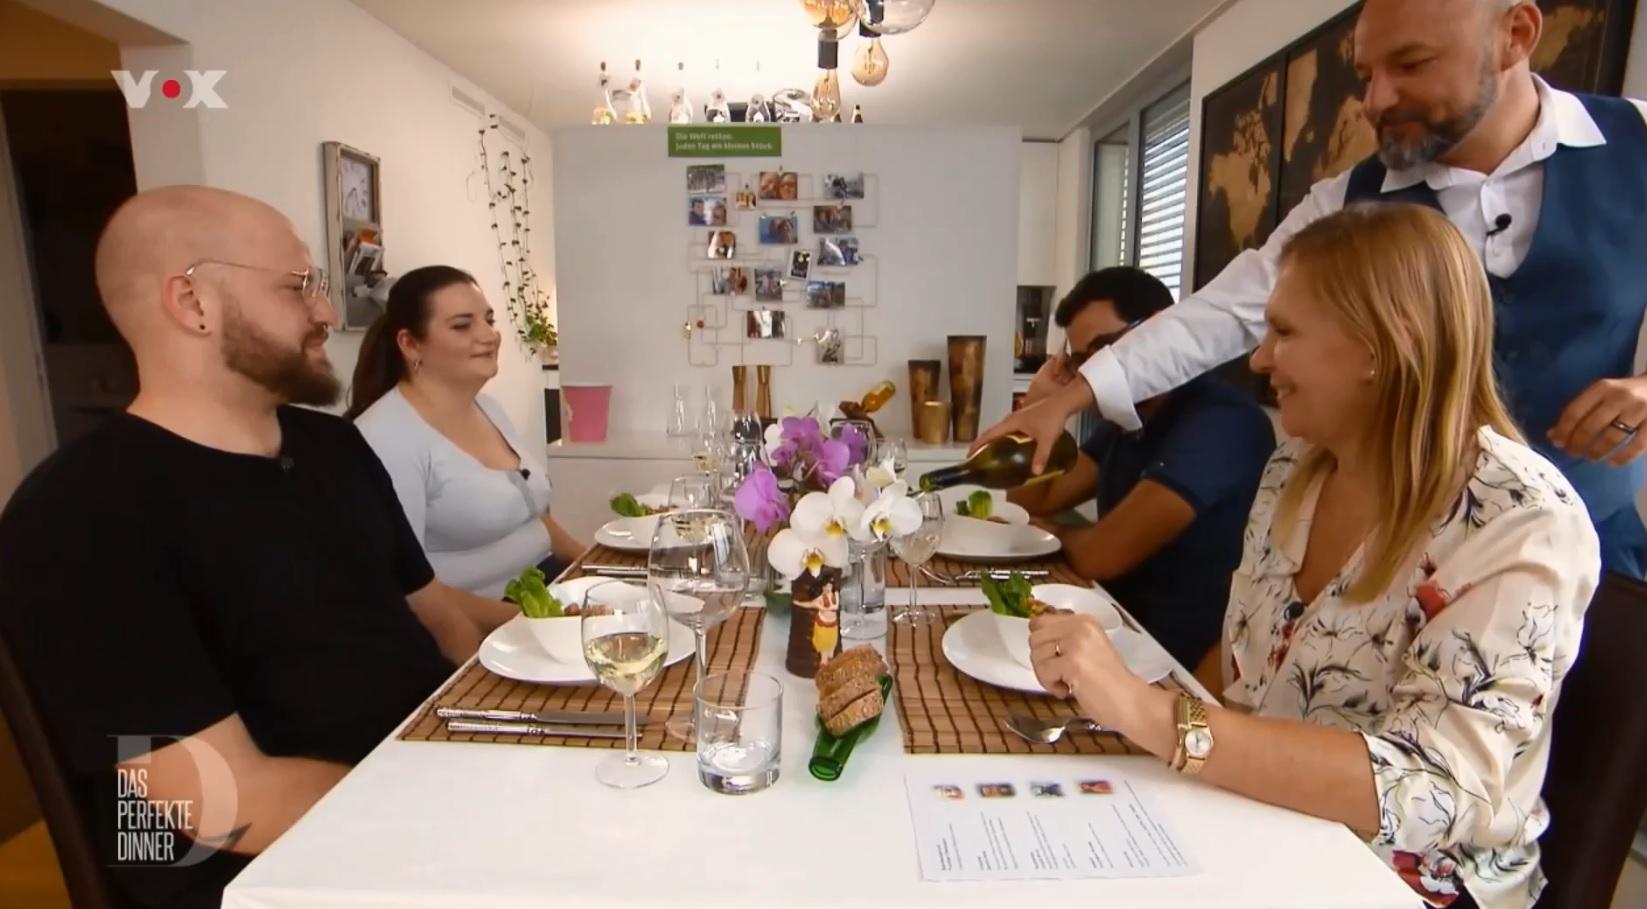 Vox mediathek das perfekte dinner | Das perfekte Dinner im